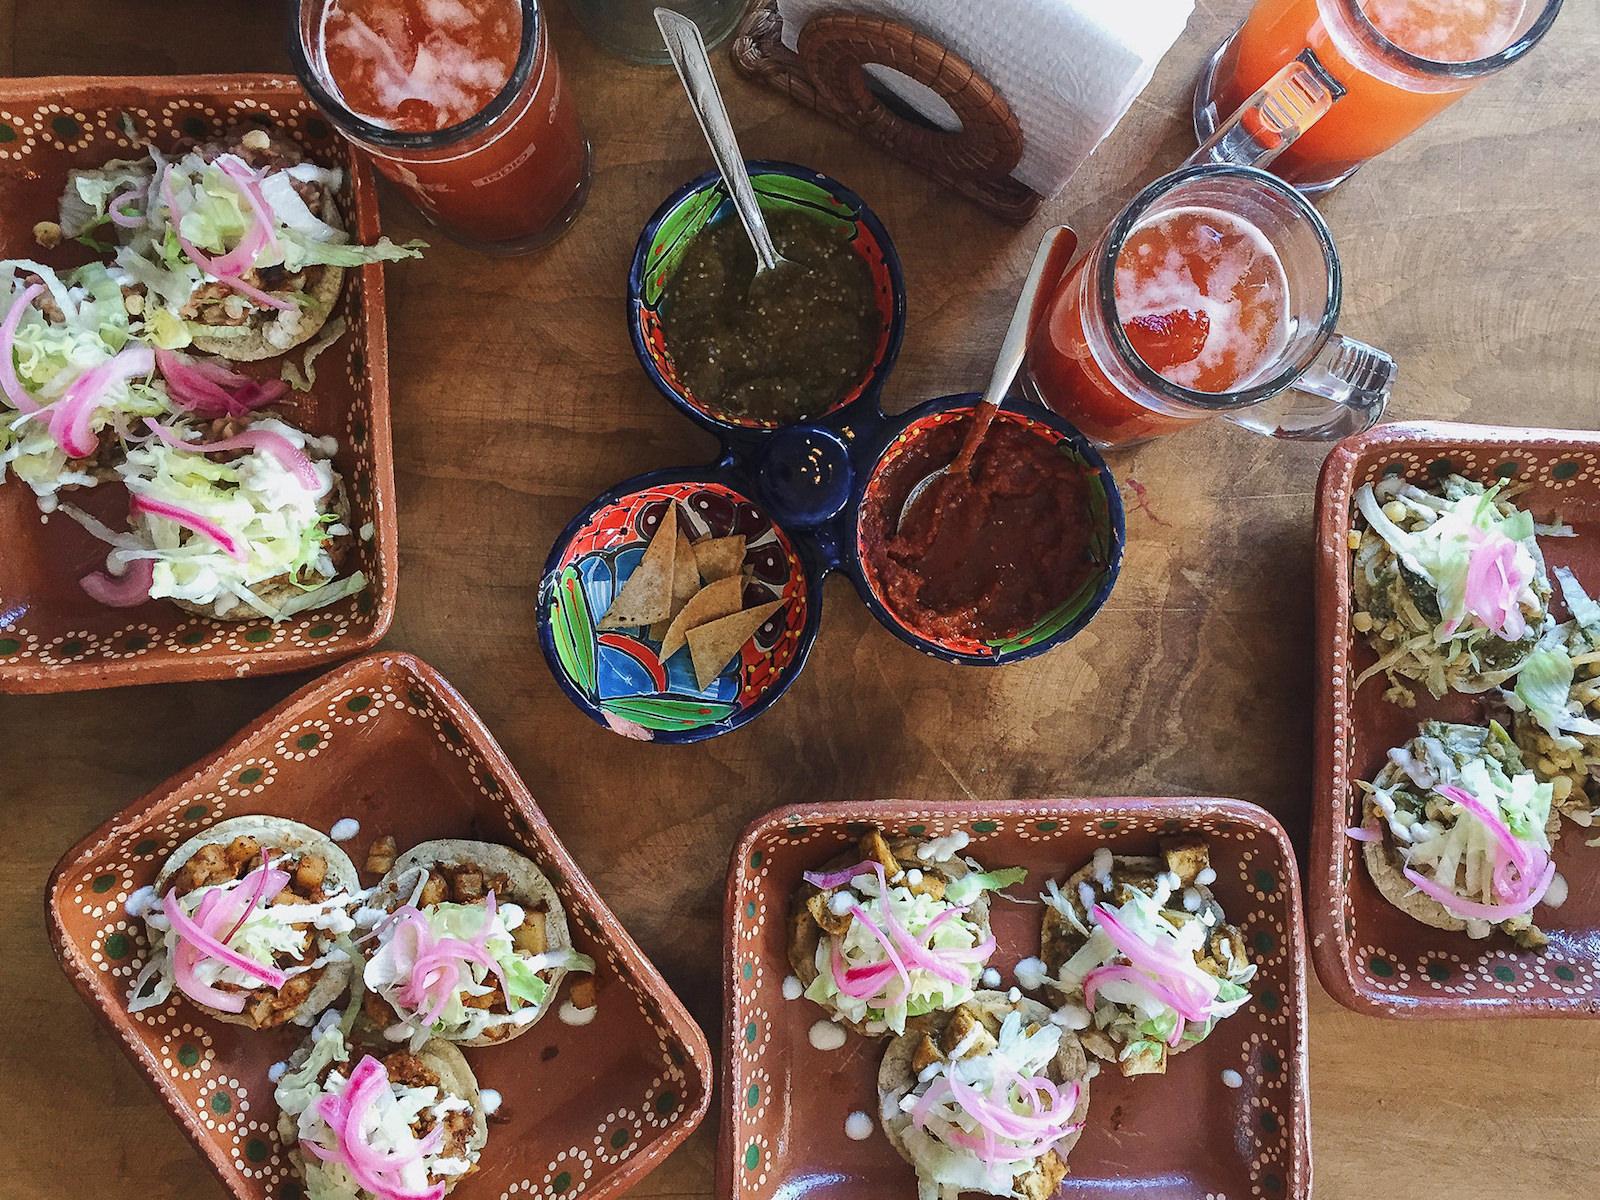 Guadalajara: La Flaca